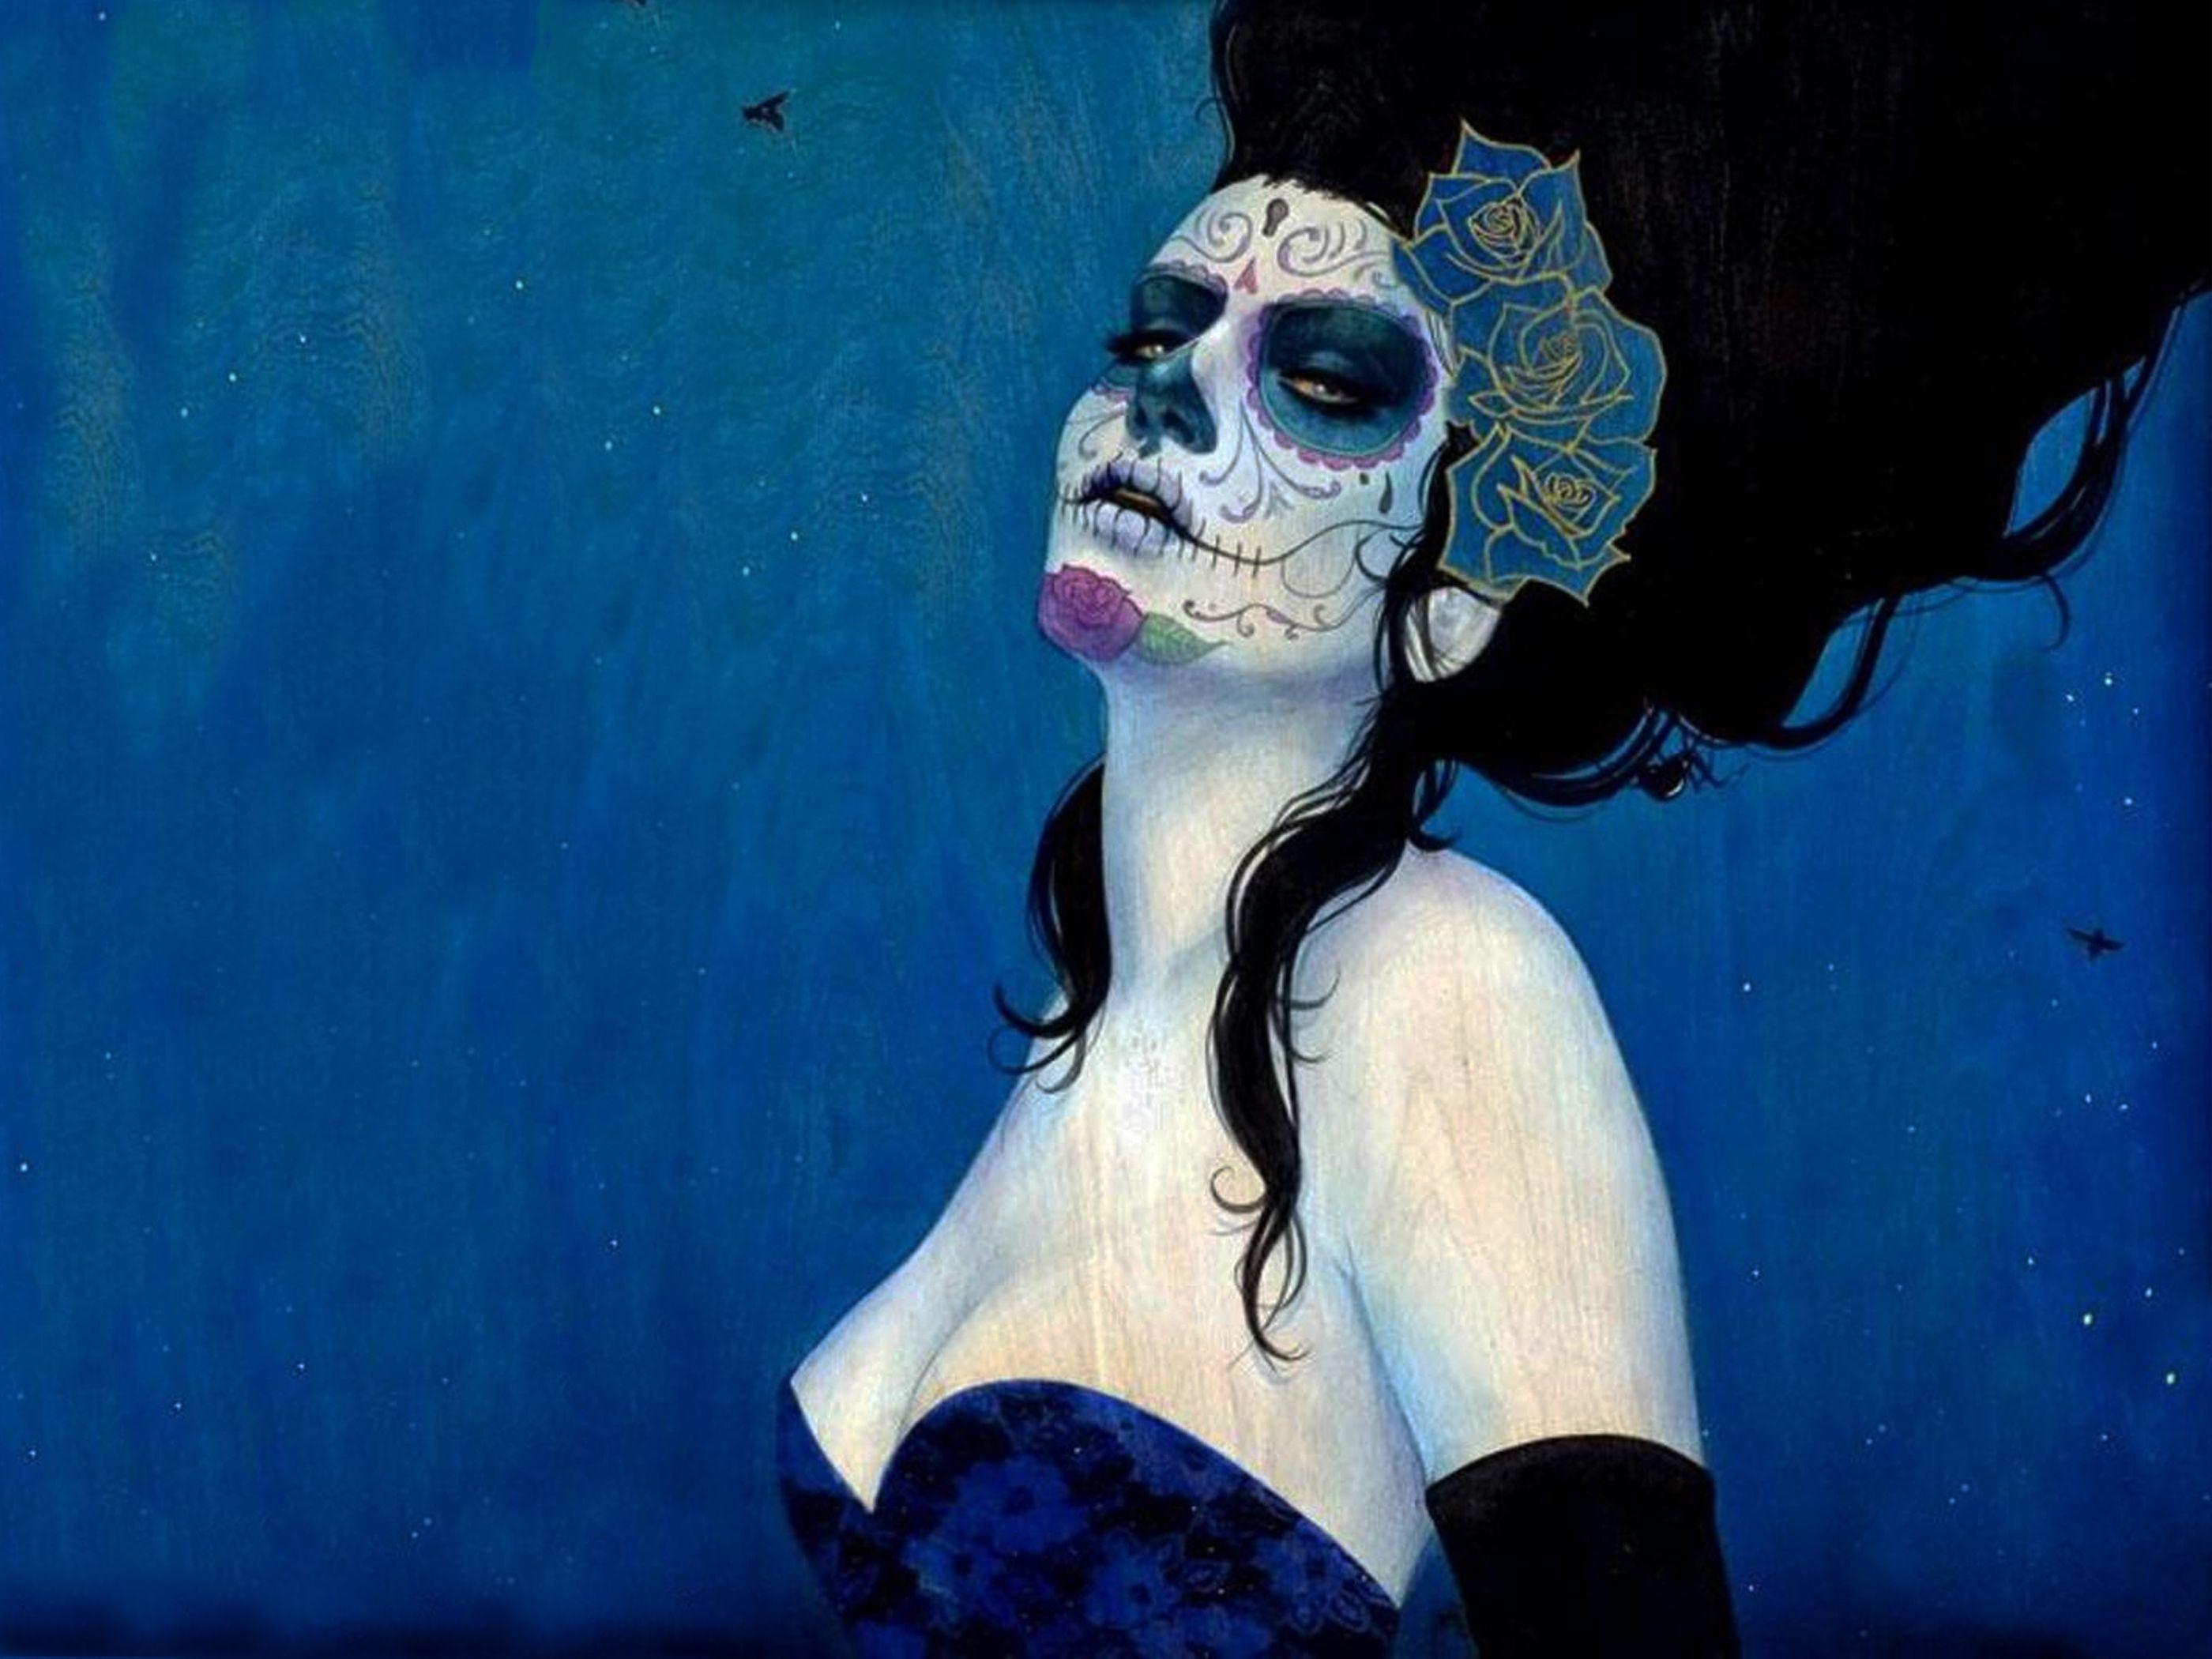 sugar skull makeup wallpaper - photo #12